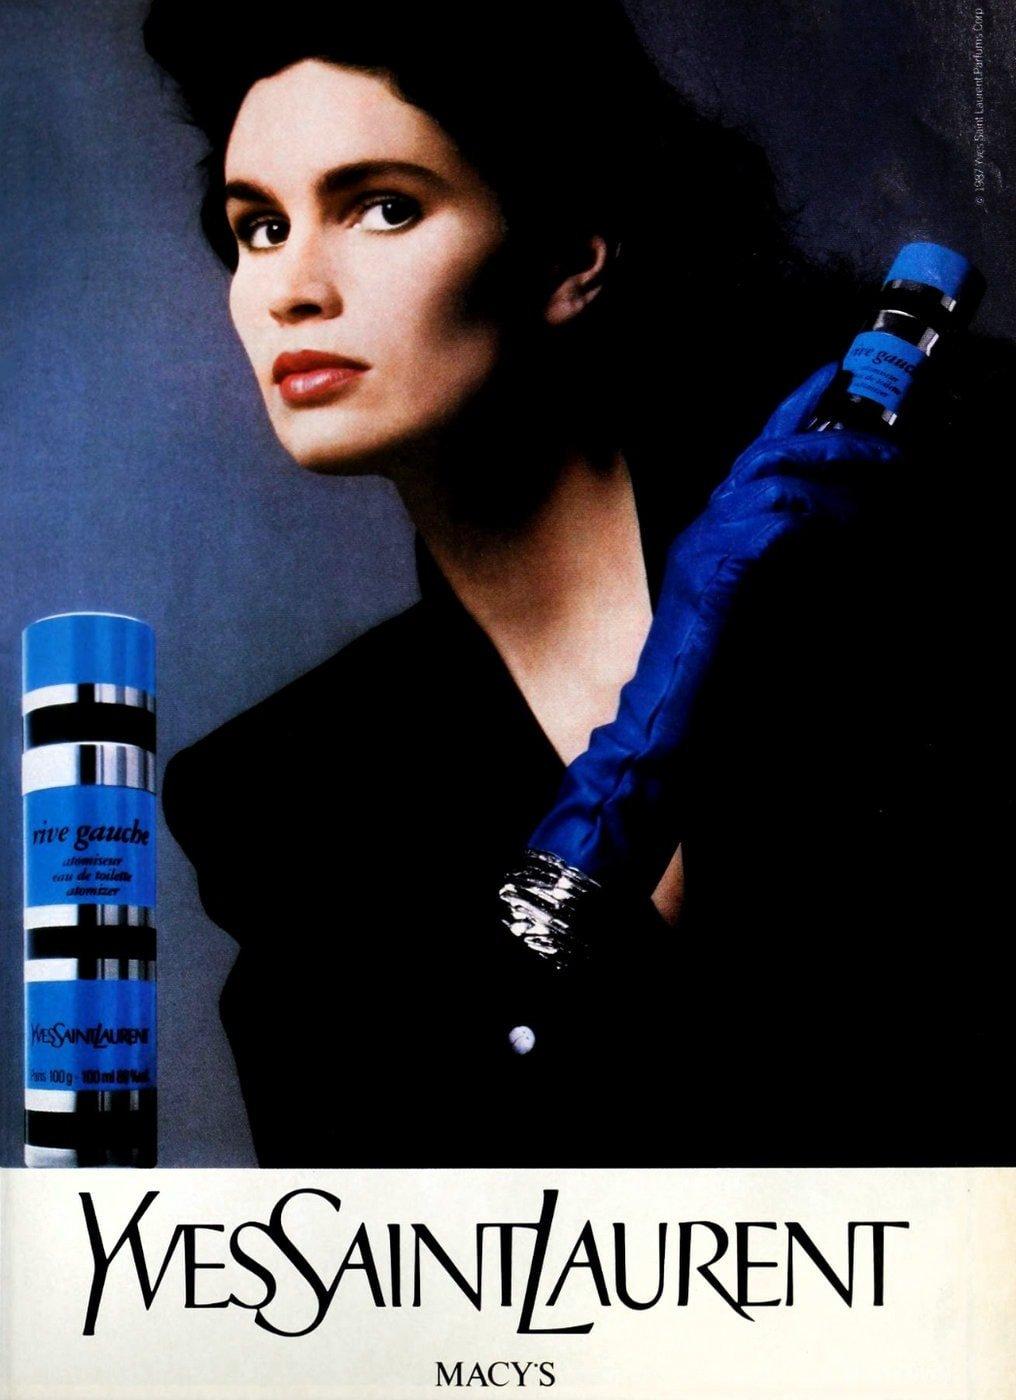 80s YSL Yves St Laurent Rive Gauche perfume